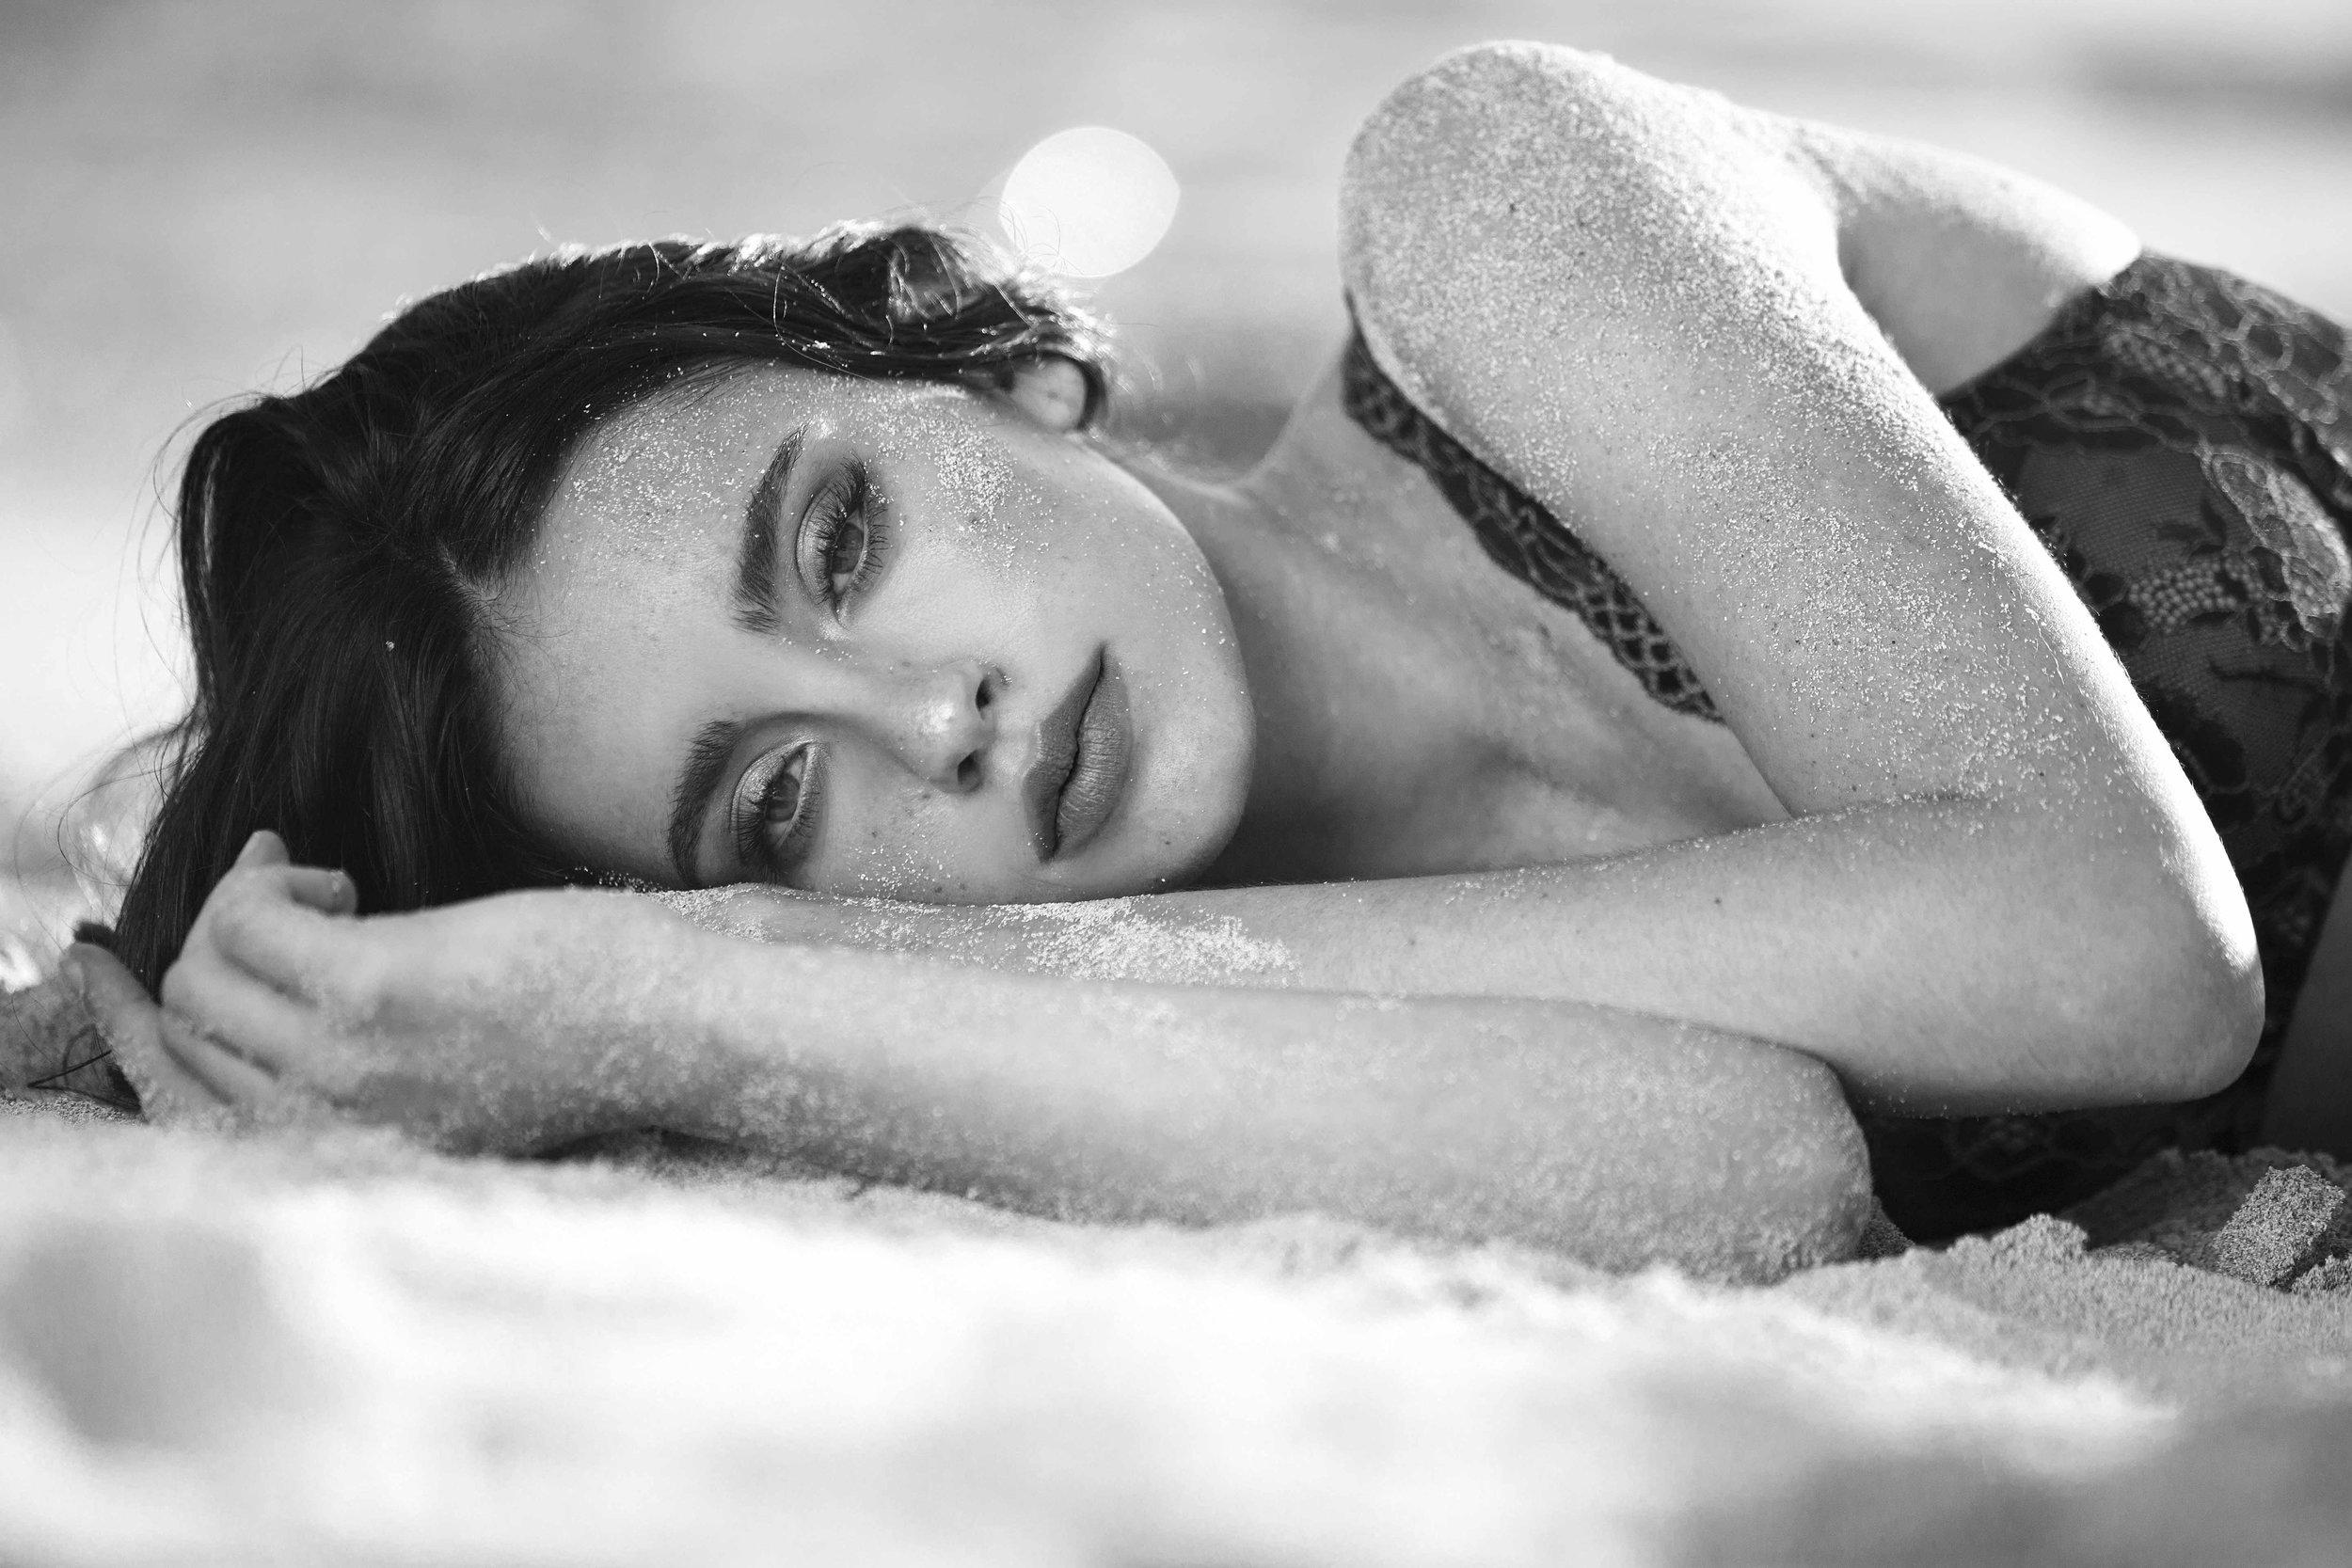 Carla Guetta by Delphine Brunner